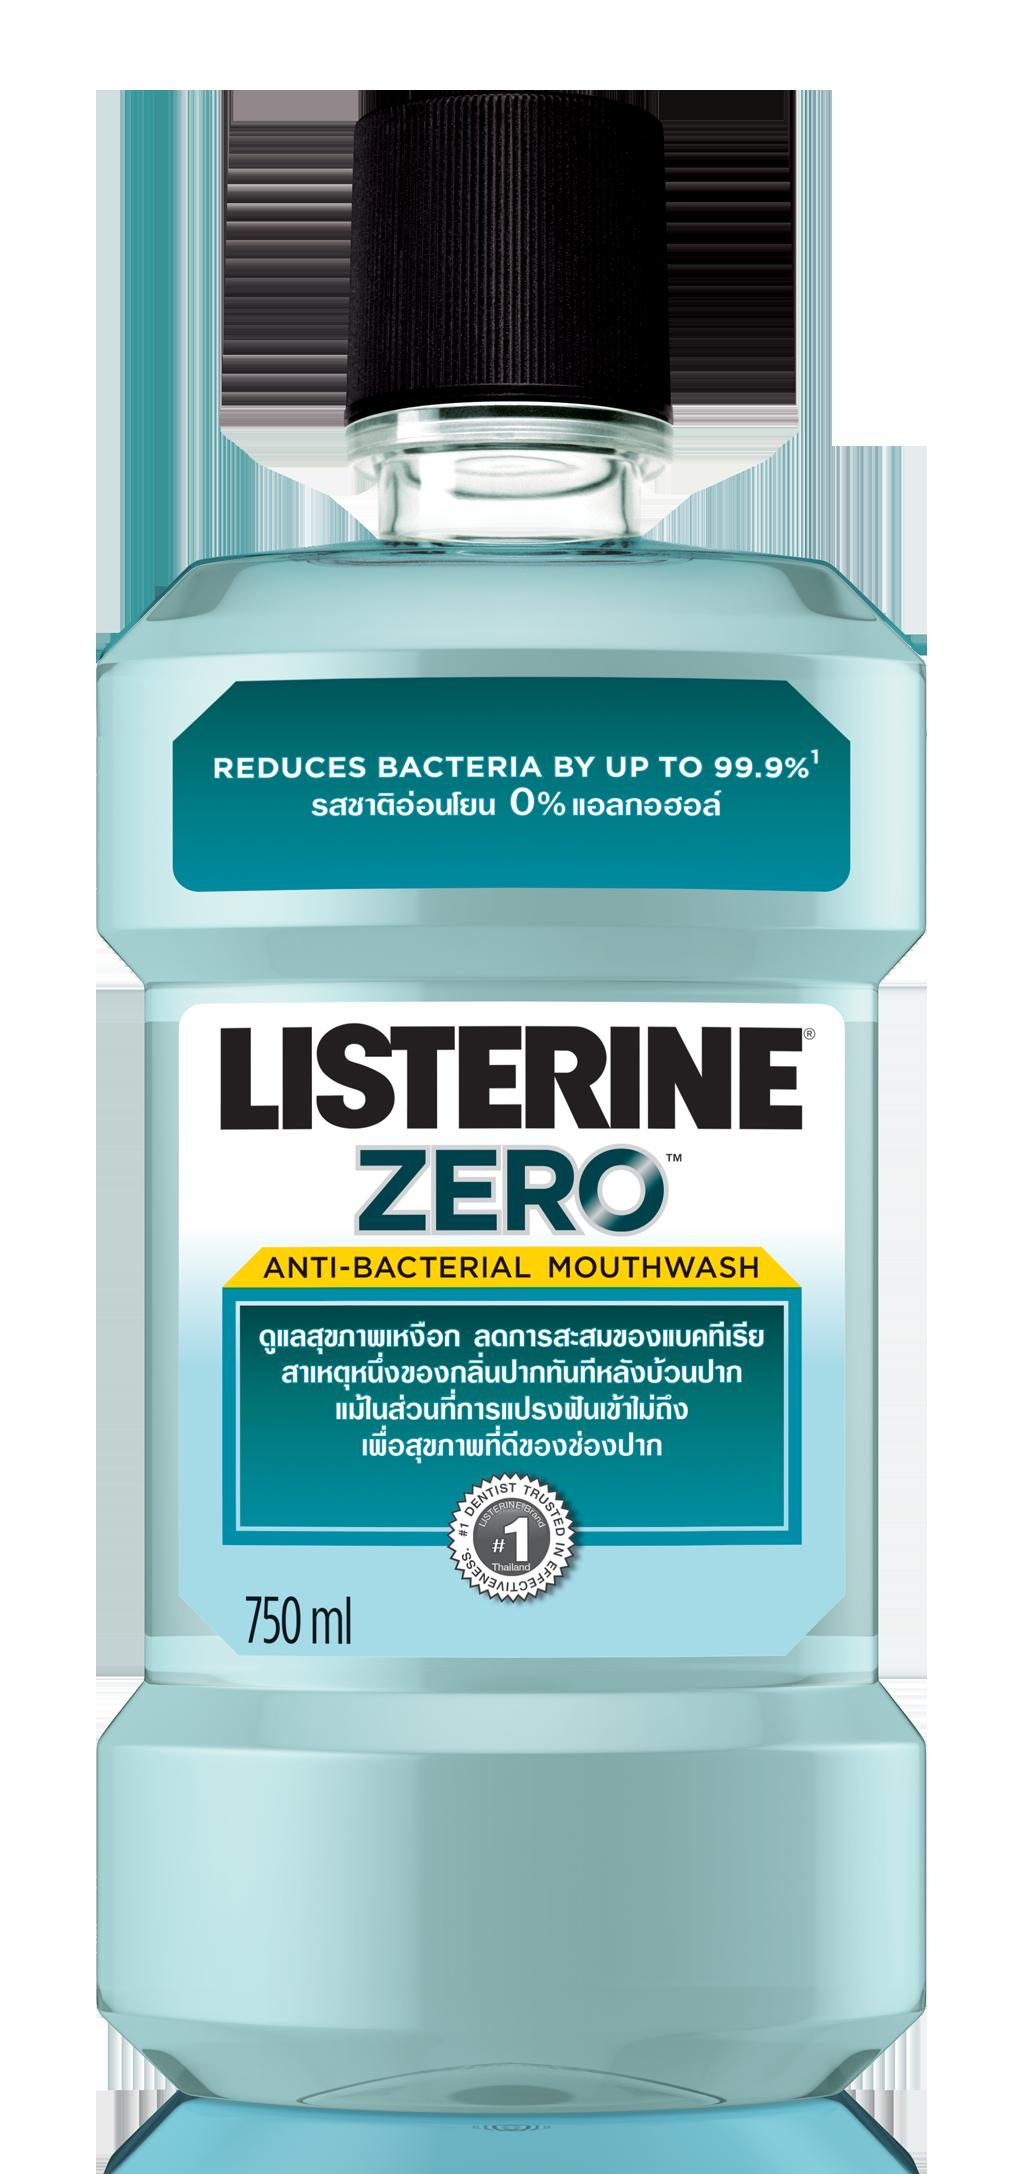 Listerineน้ำยาบ้วนปากผสมสารแอนตี้แบคทีเรีย รสชาติอ่อนโยน 0% แอลกอฮอล์ 750ml